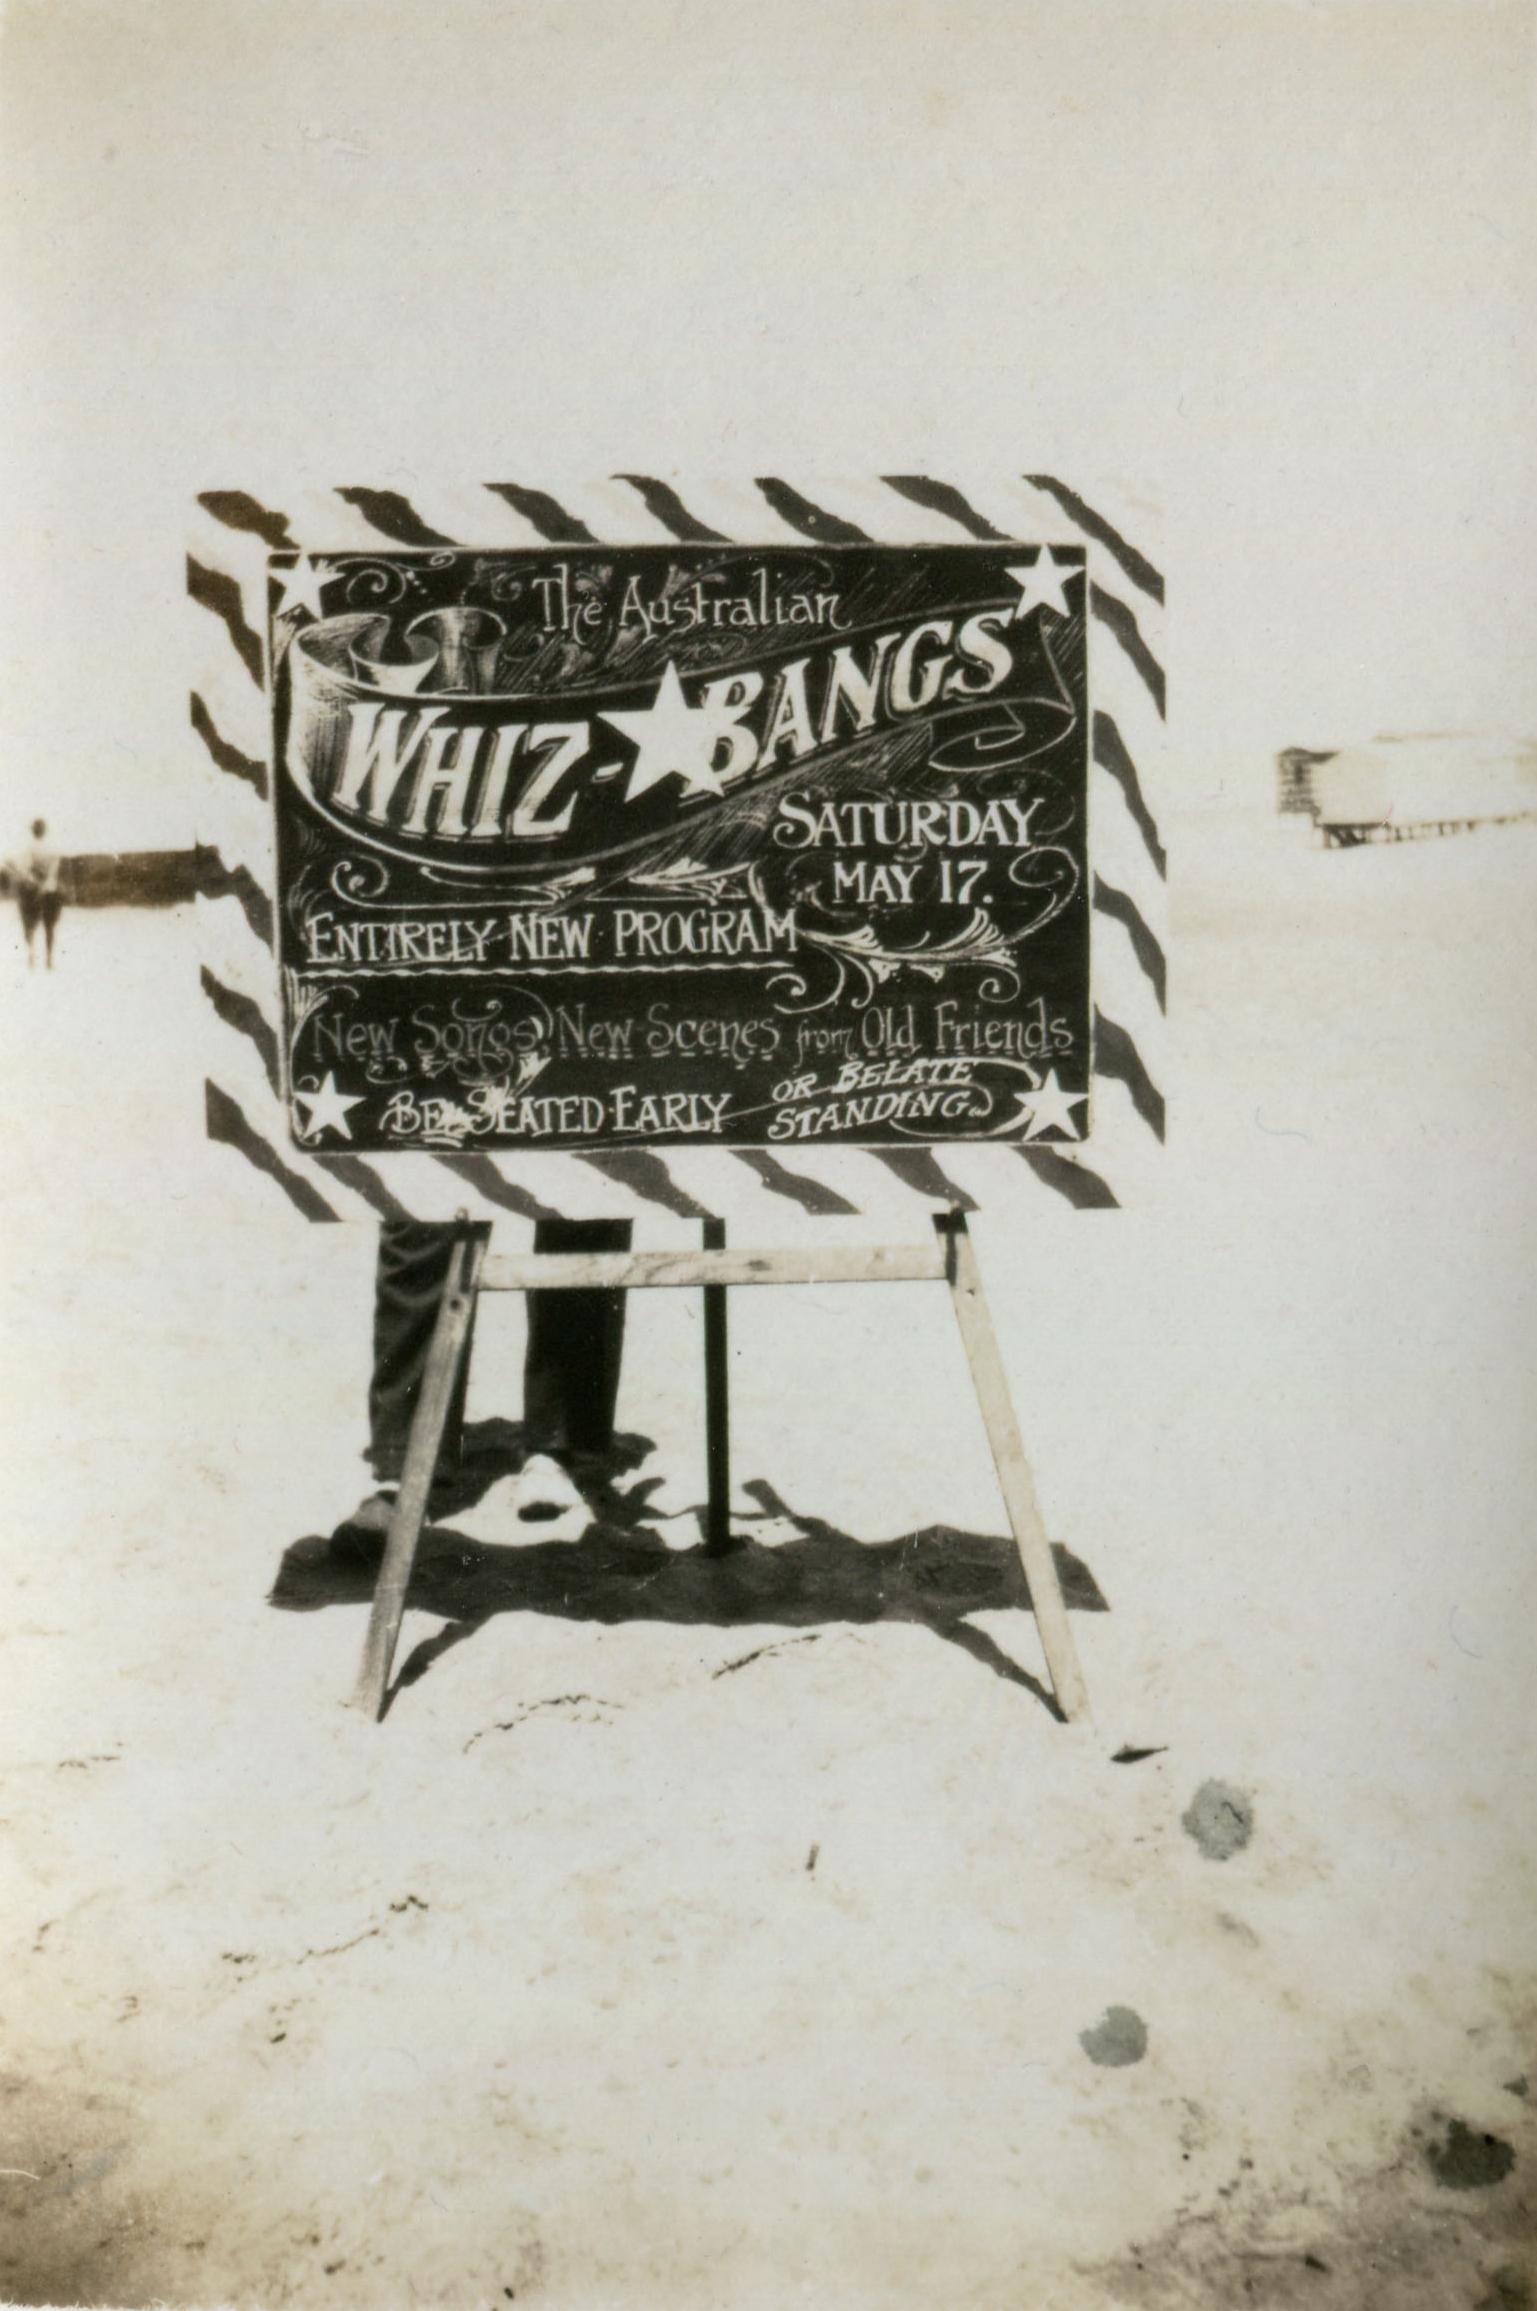 reg walters031 Whiz Bangs playing Sat 17 May 1919.jpg